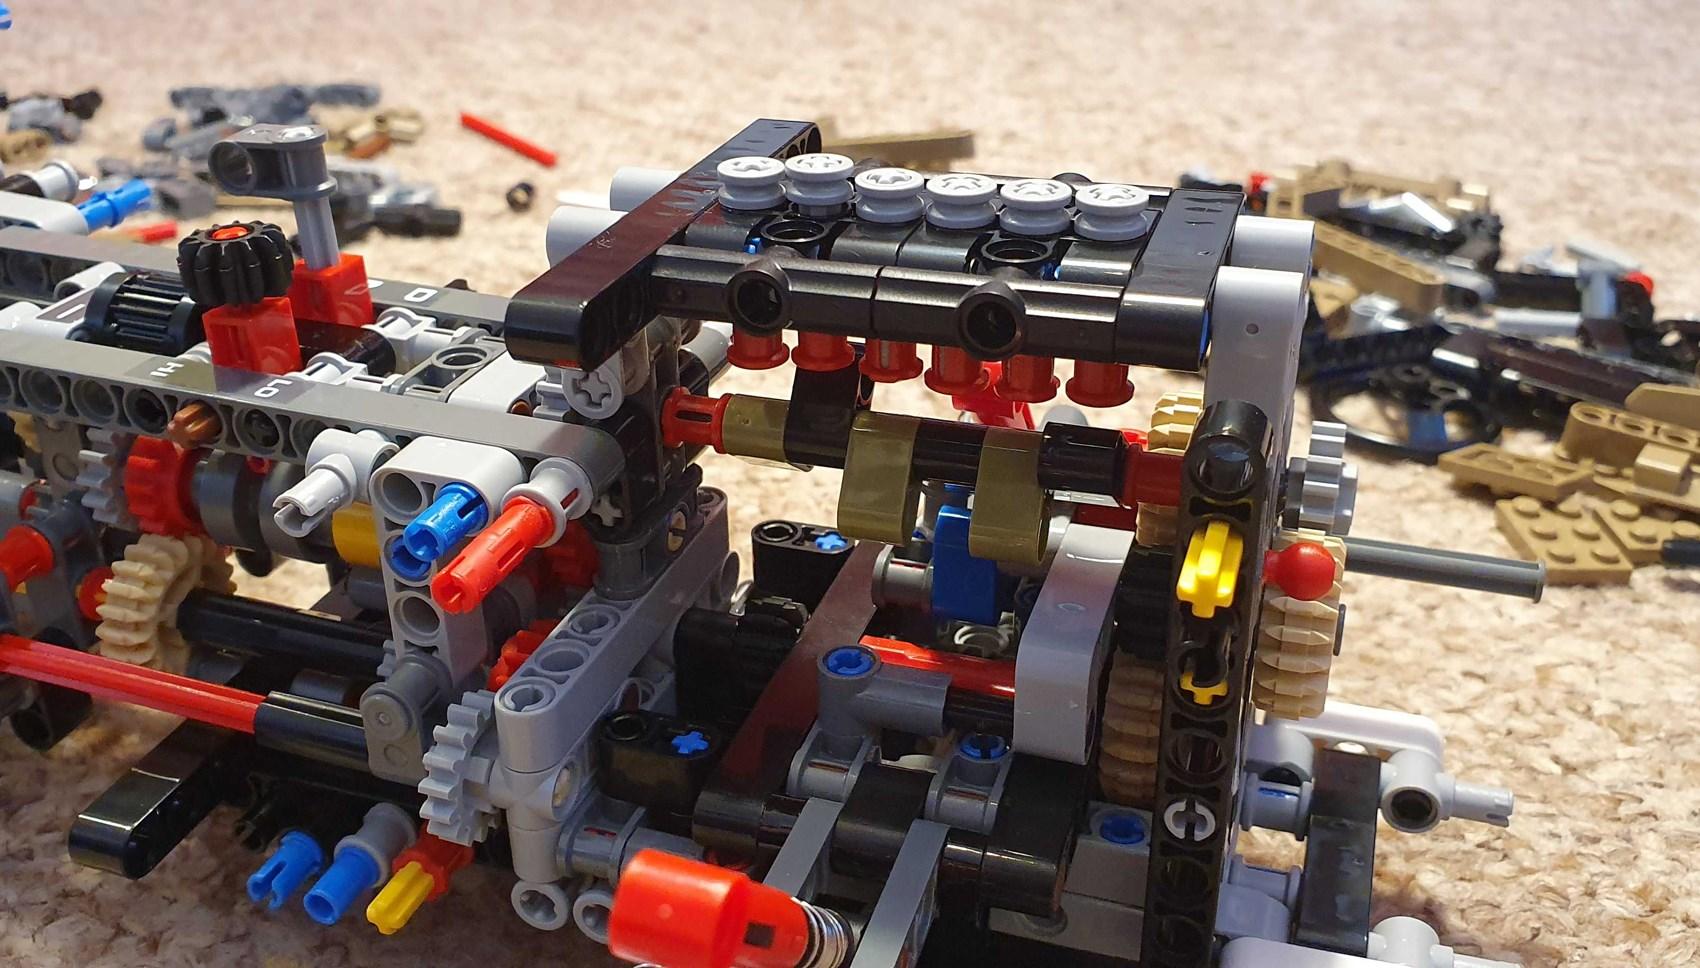 Lego Defender building